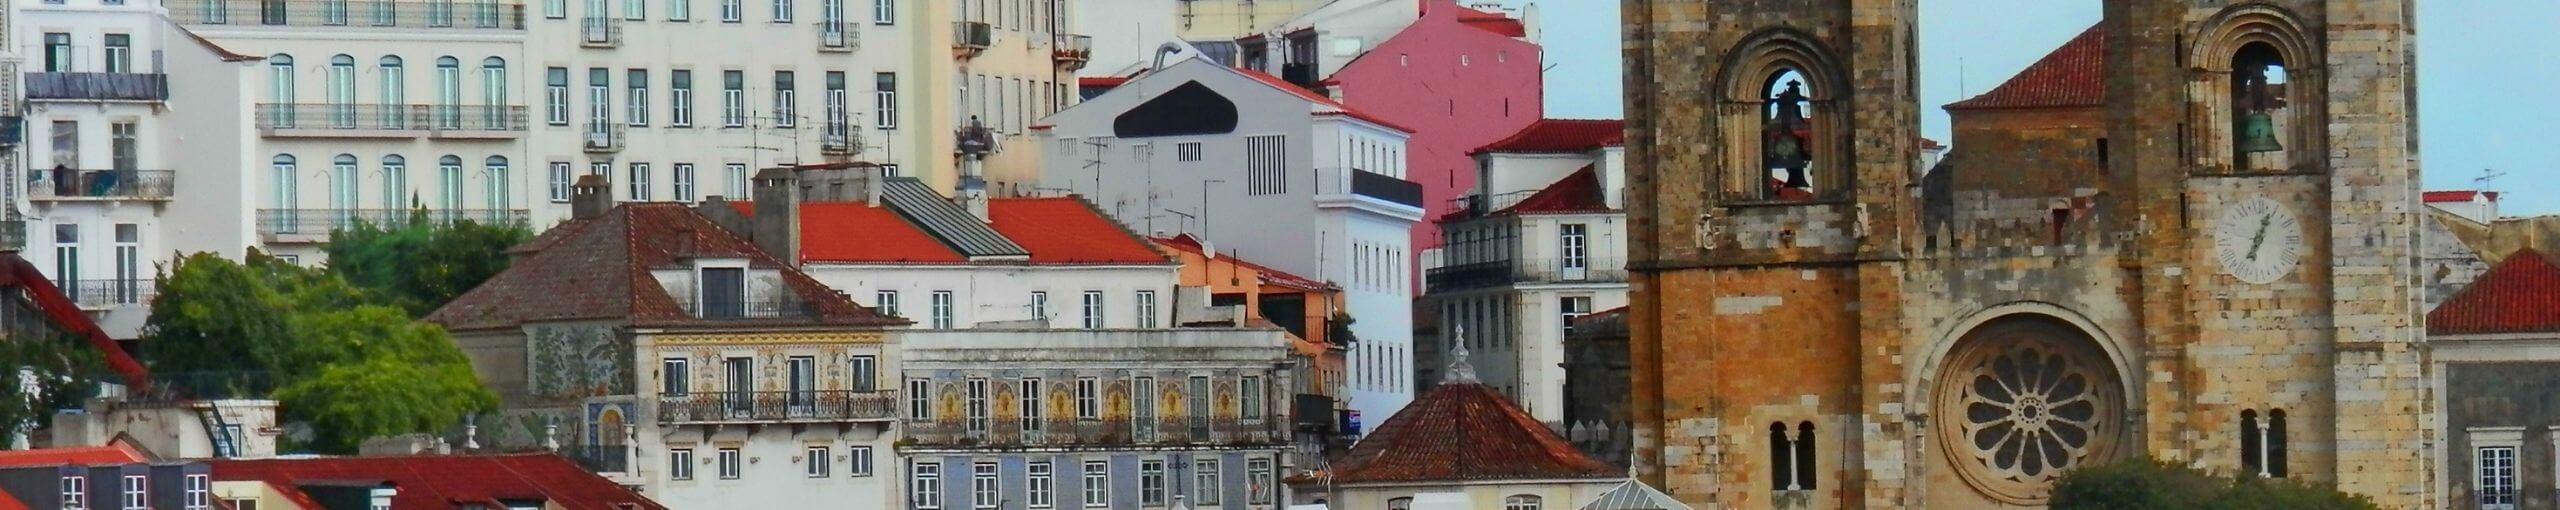 Lisboa Corazón de Fado. Portugal.